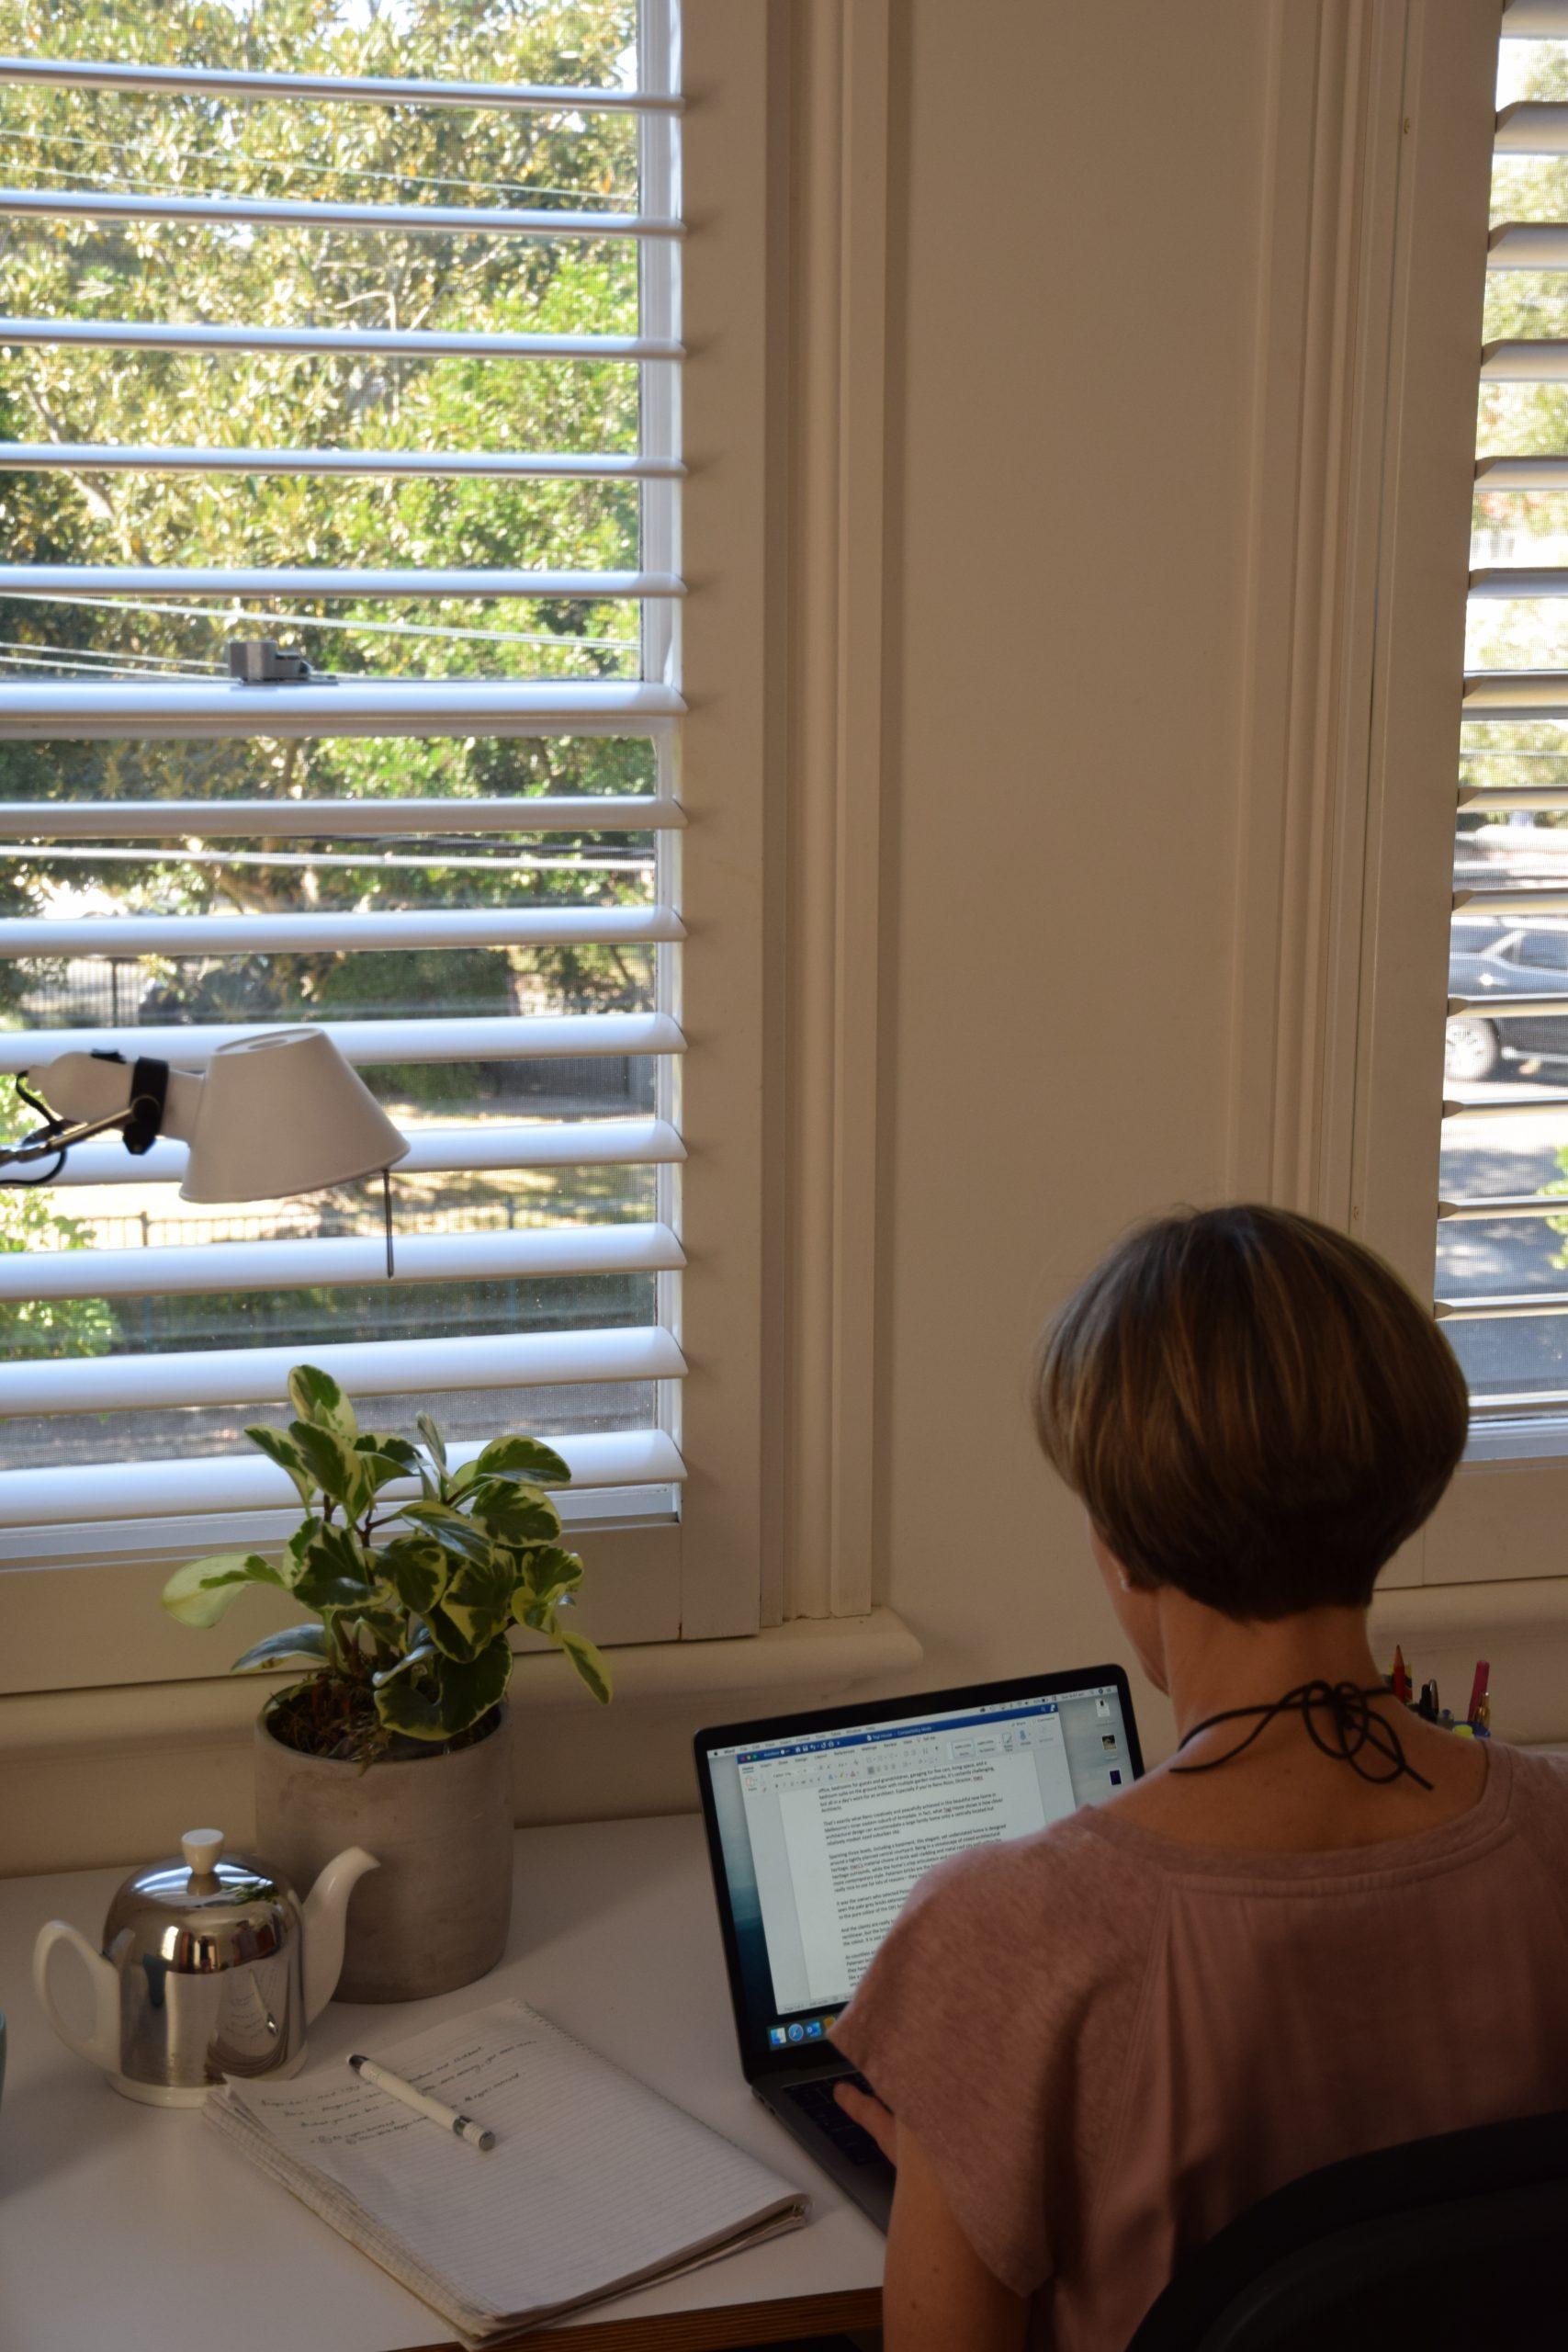 Freelance copywriter Sydney, Belinda Findlay